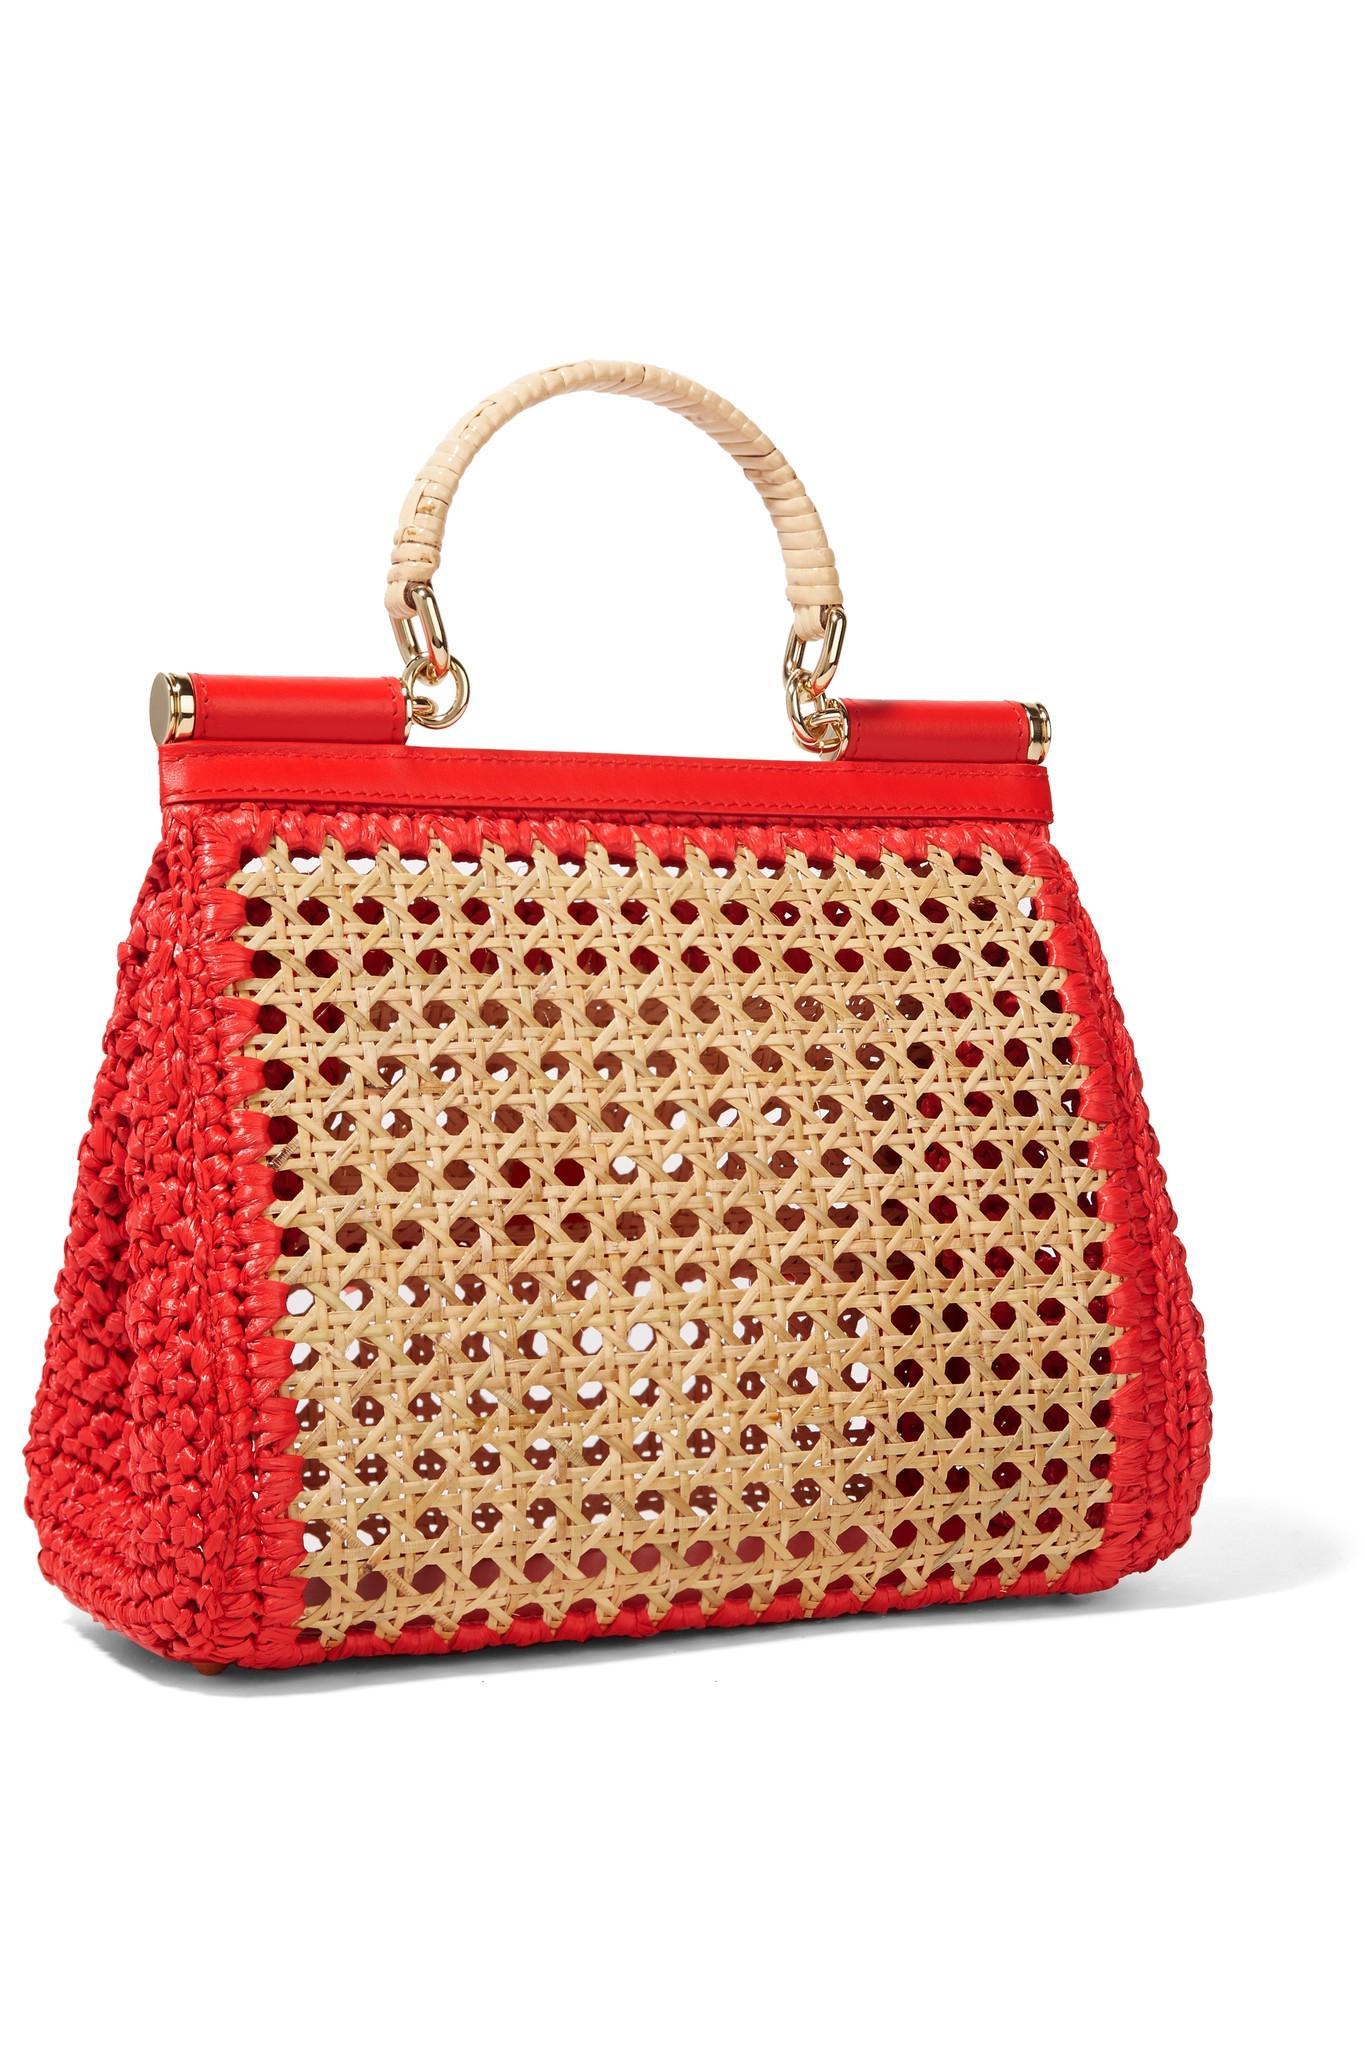 Dolce   Gabbana - Natural Sicily Medium Leather-trimmed Raffia Tote - Lyst.  View fullscreen cc9d41dbe3b16